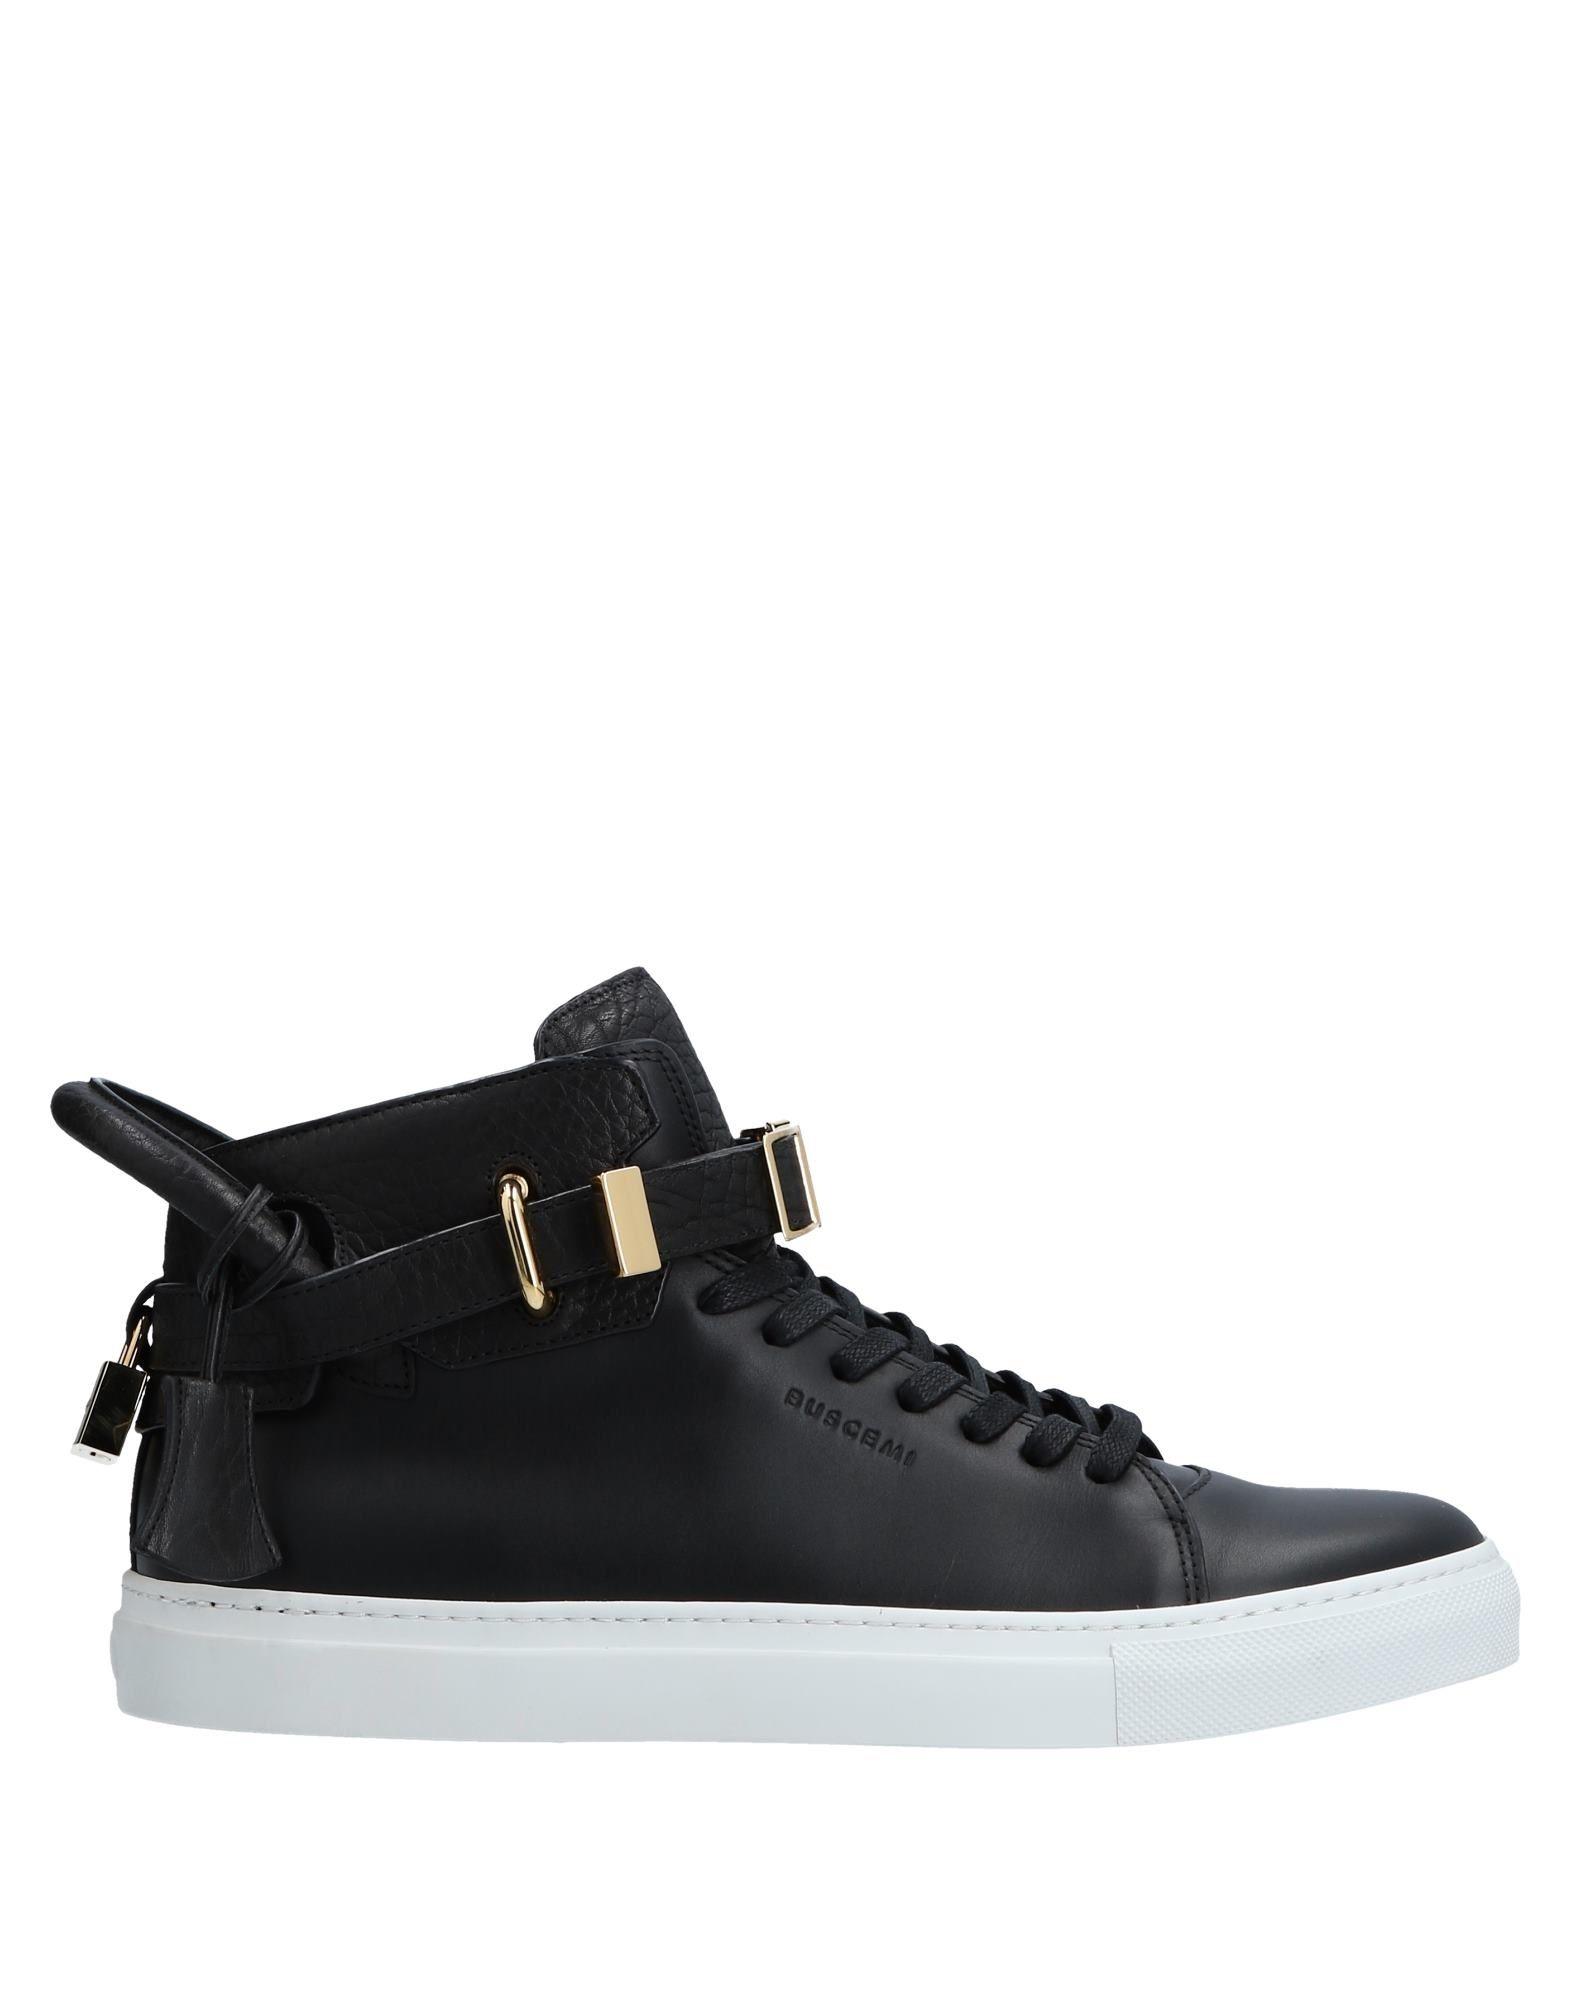 Buscemi Sneakers Herren  11530602FA Gute Qualität beliebte Schuhe